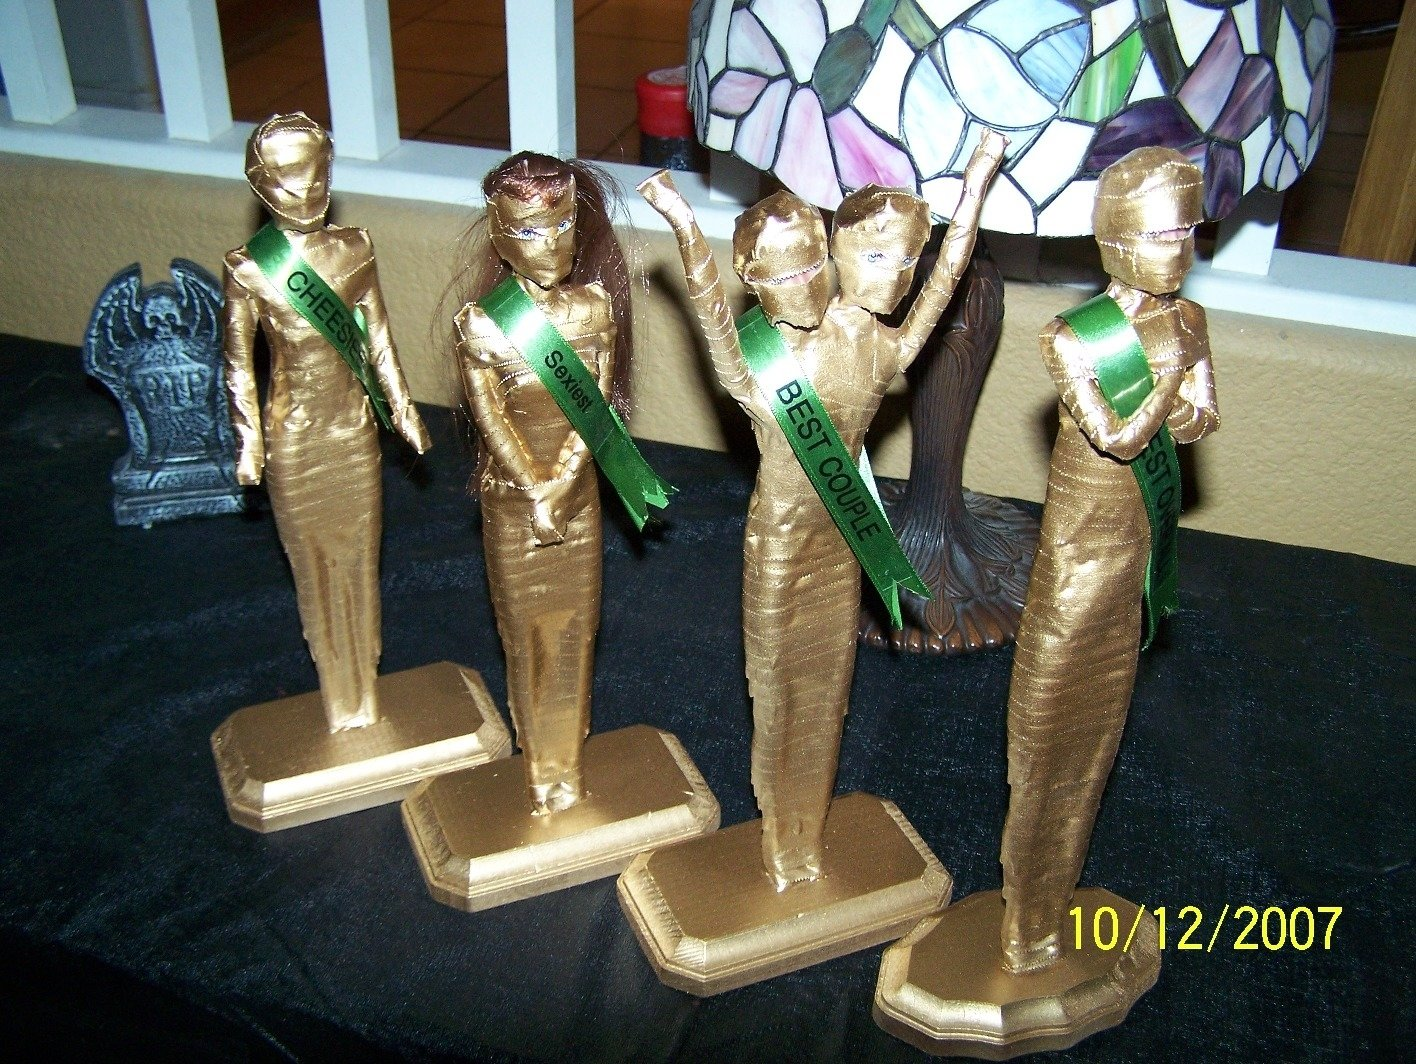 10 Beautiful Halloween Costume Contest Prize Ideas costume contest categories best costume prize ideas samorzady 2020